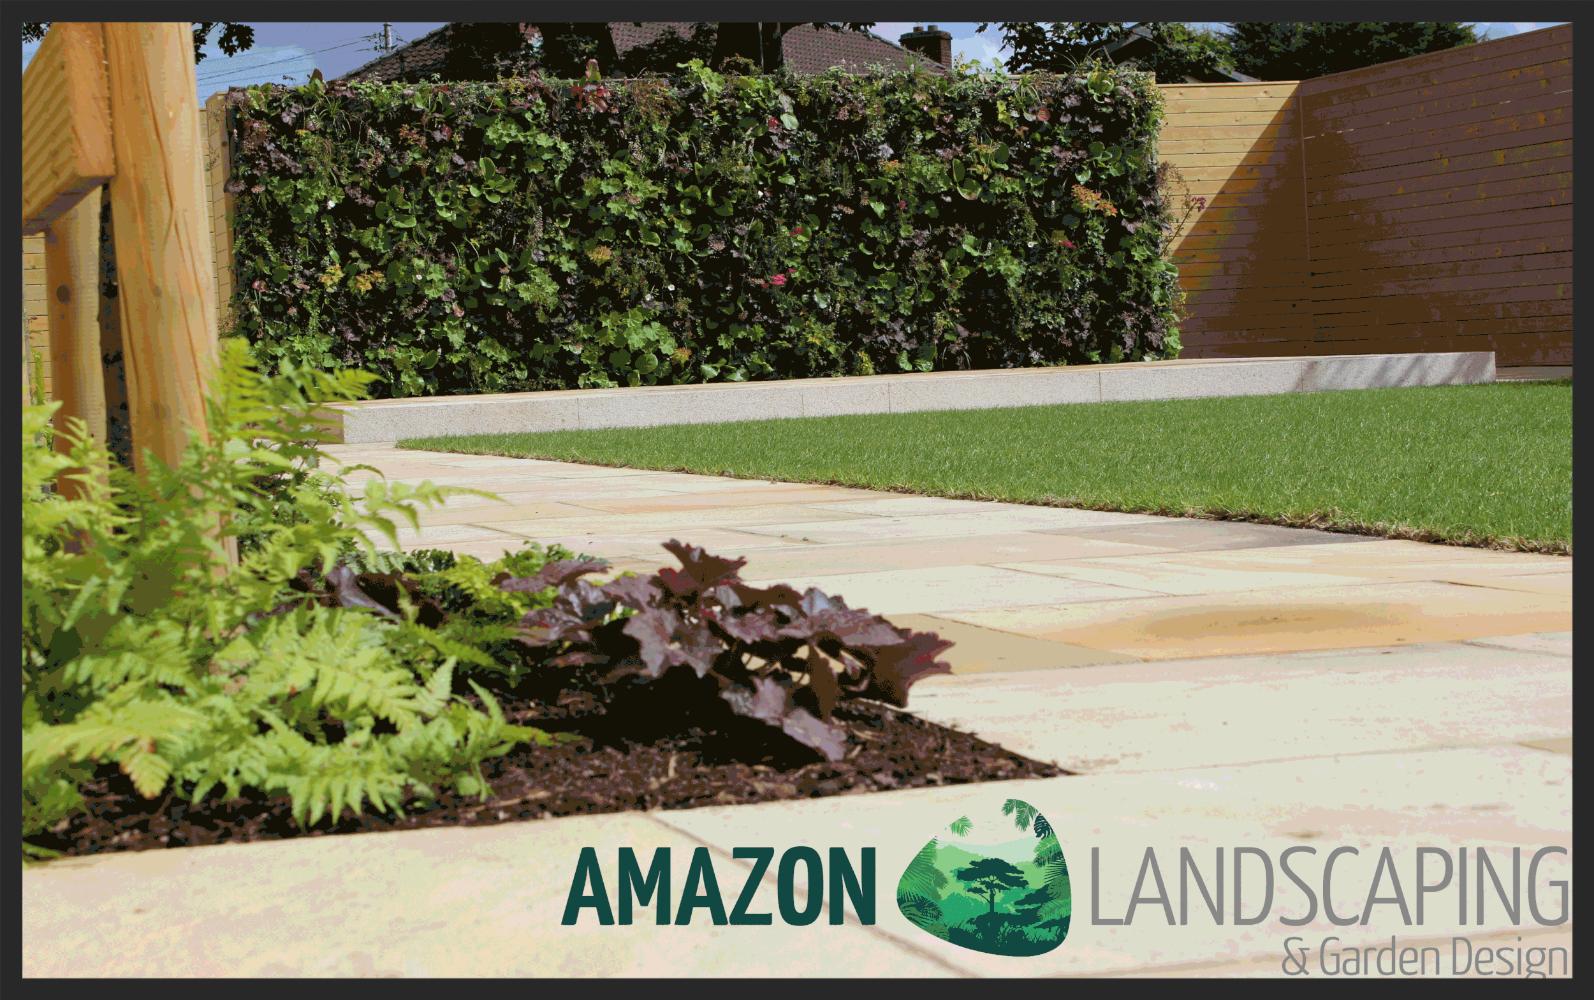 Amazon Landscaping Dublin - Award winning landscapers